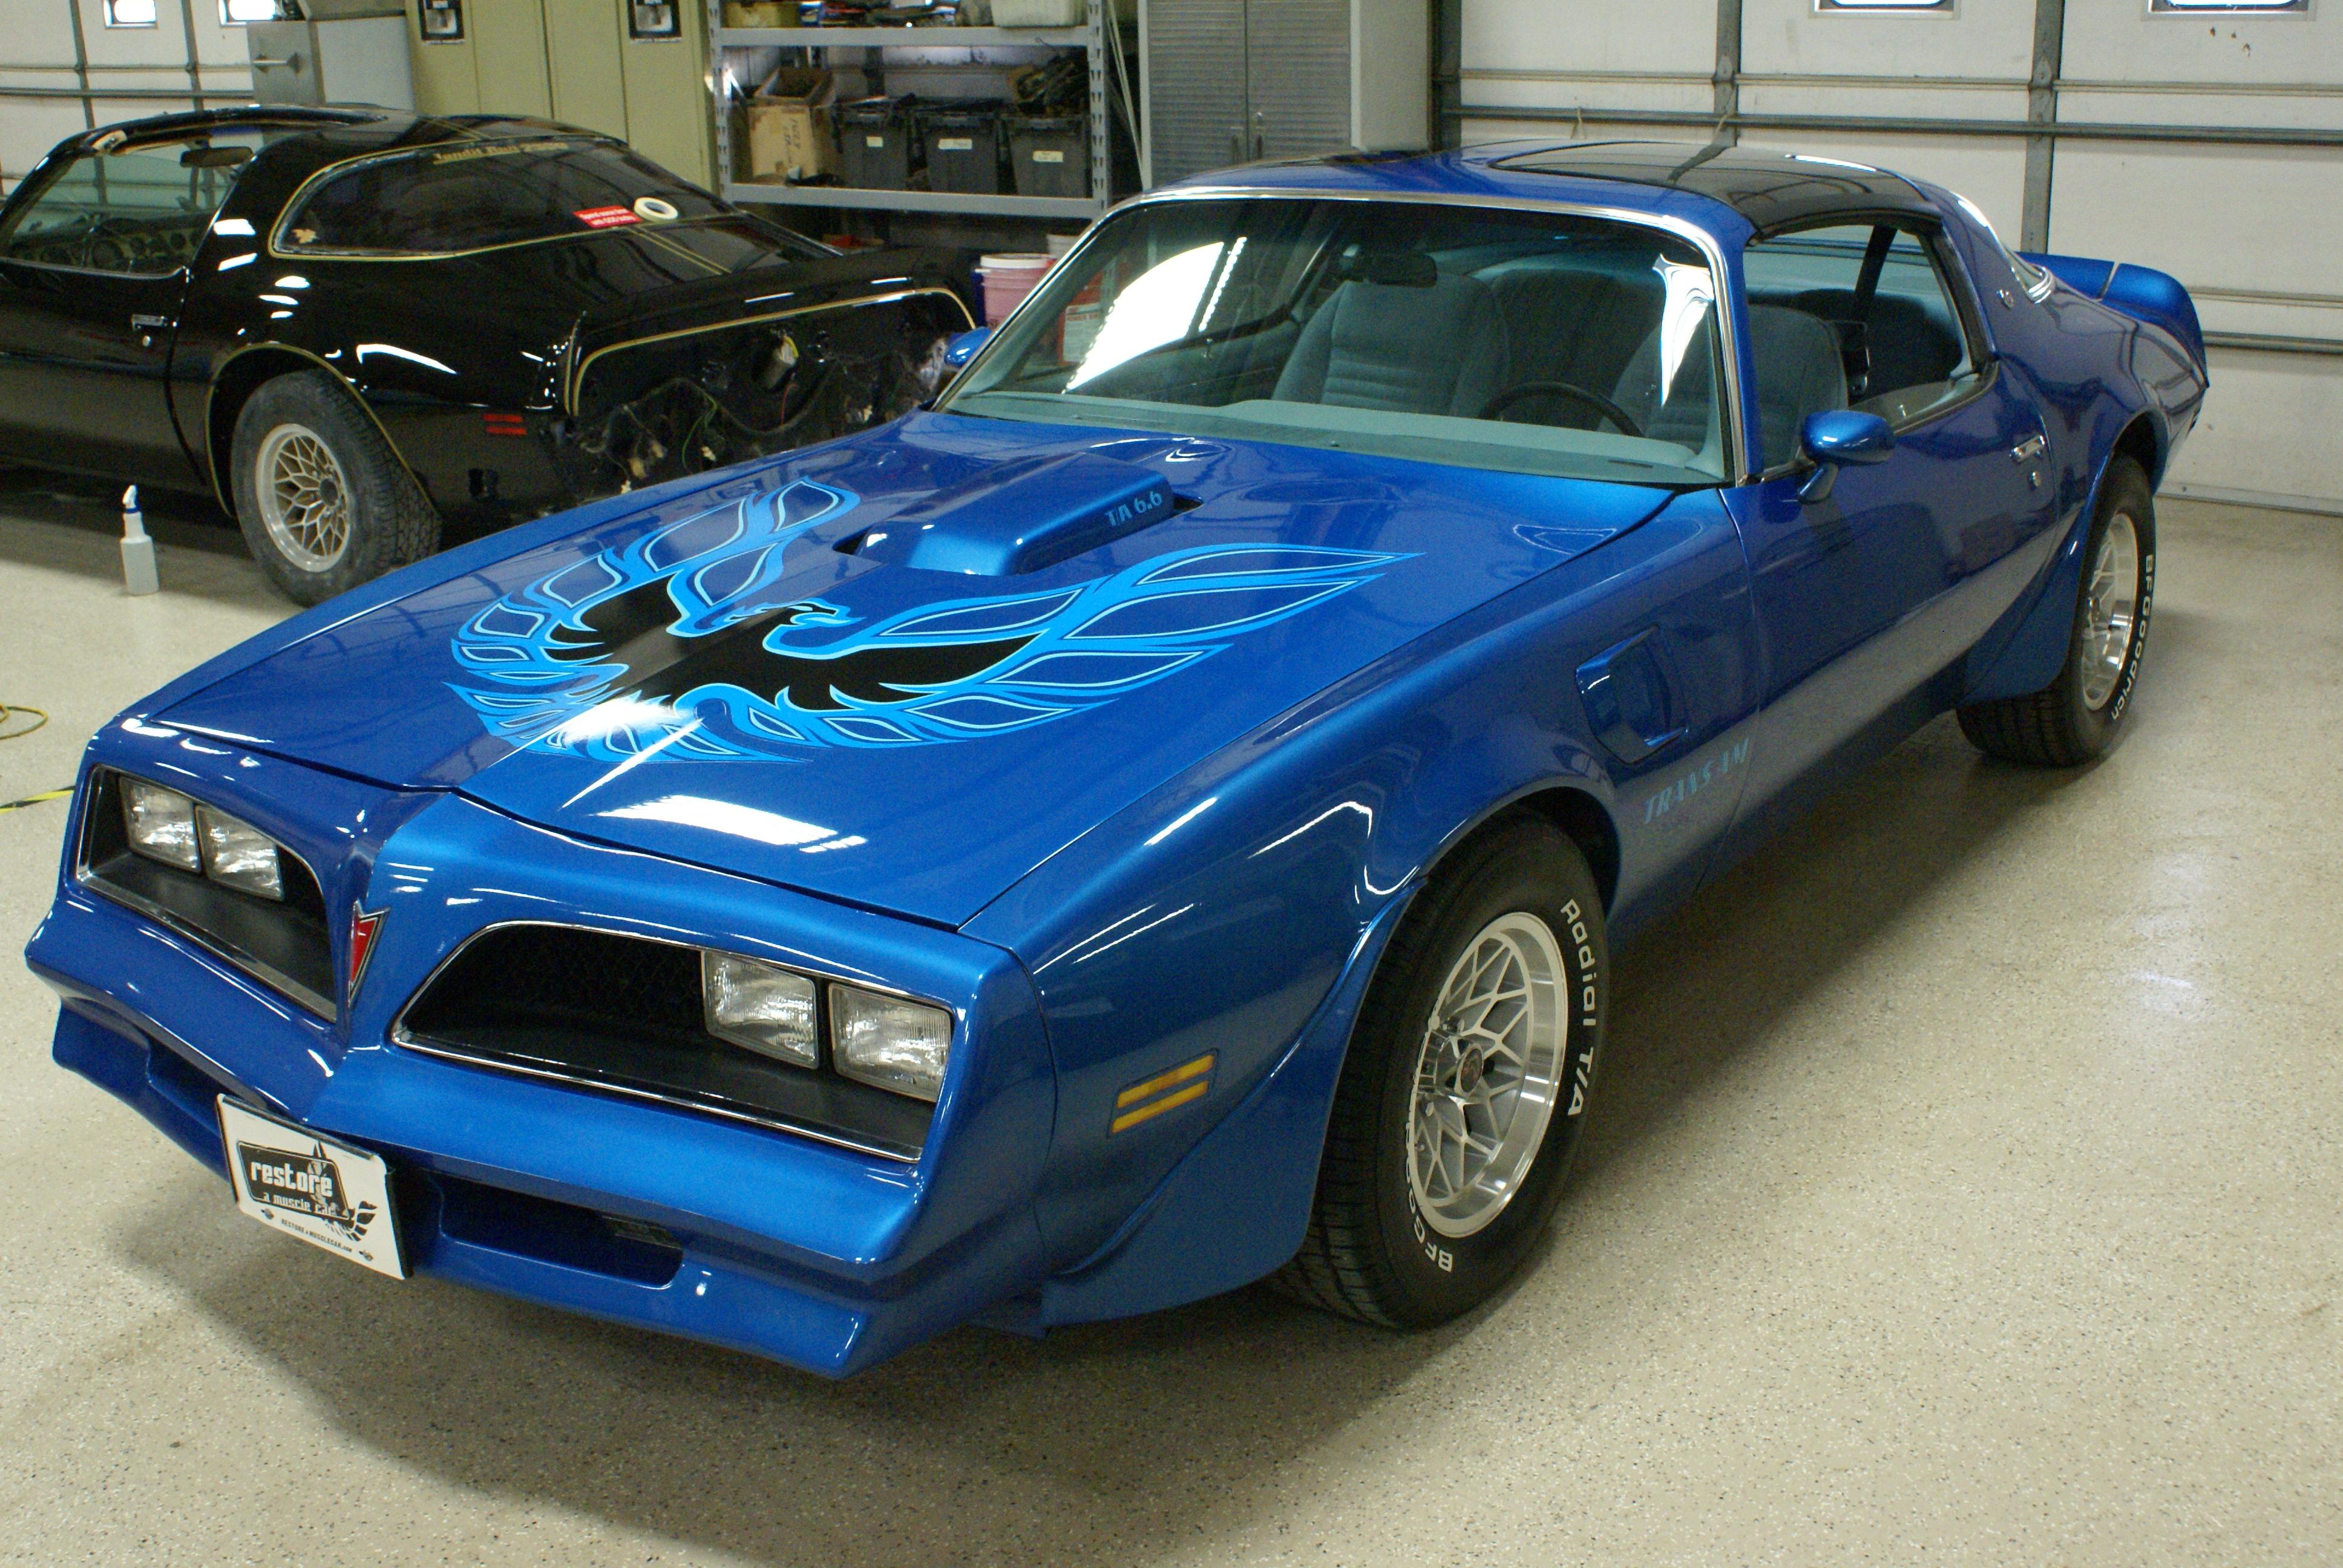 78 Trans Am Martinique Blue Auto W72 T Tops Flickr